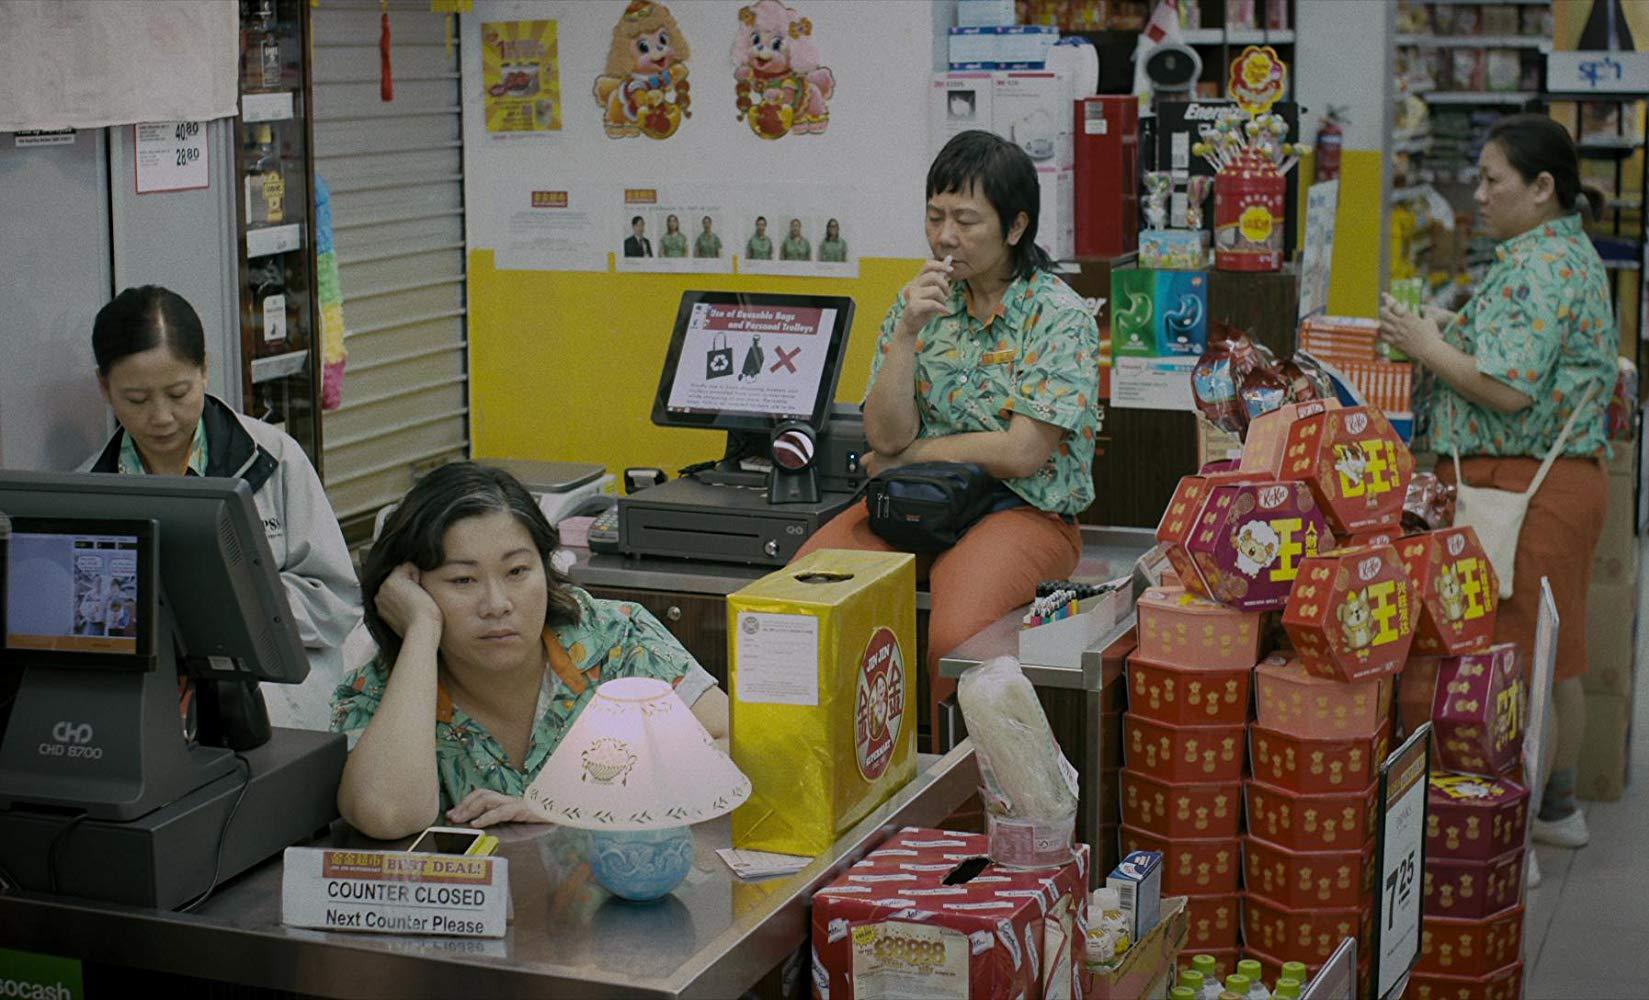 things to do in september - CA$H short film